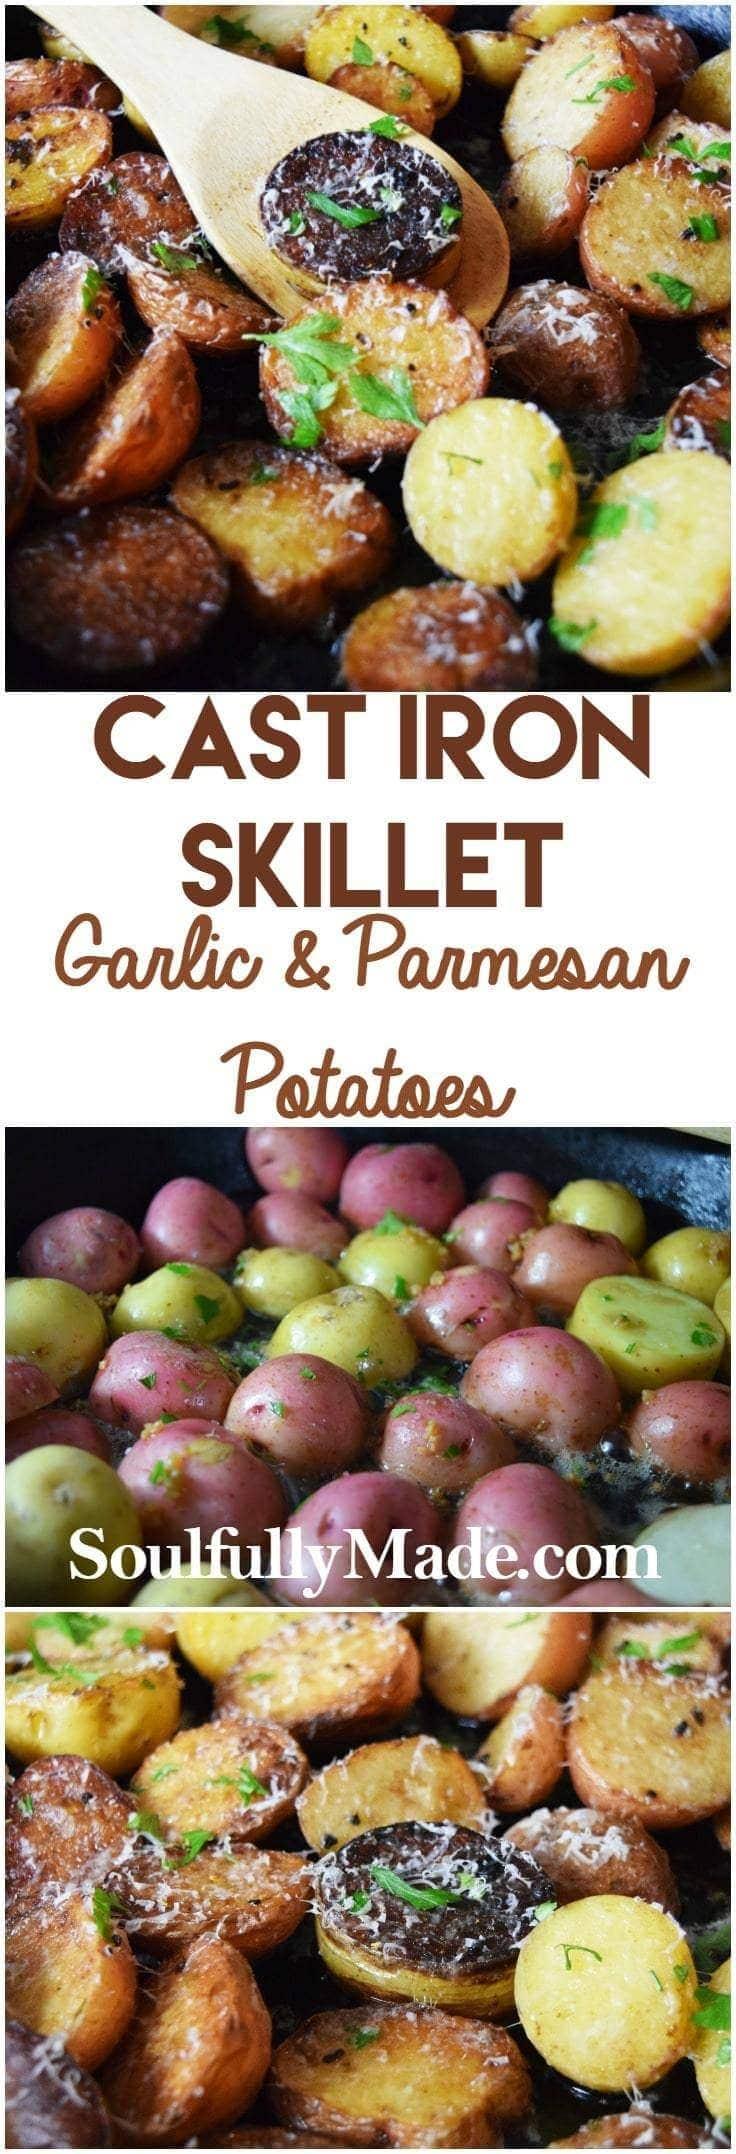 Cast Iron Skillet Garlic & Parmesan Potatoes